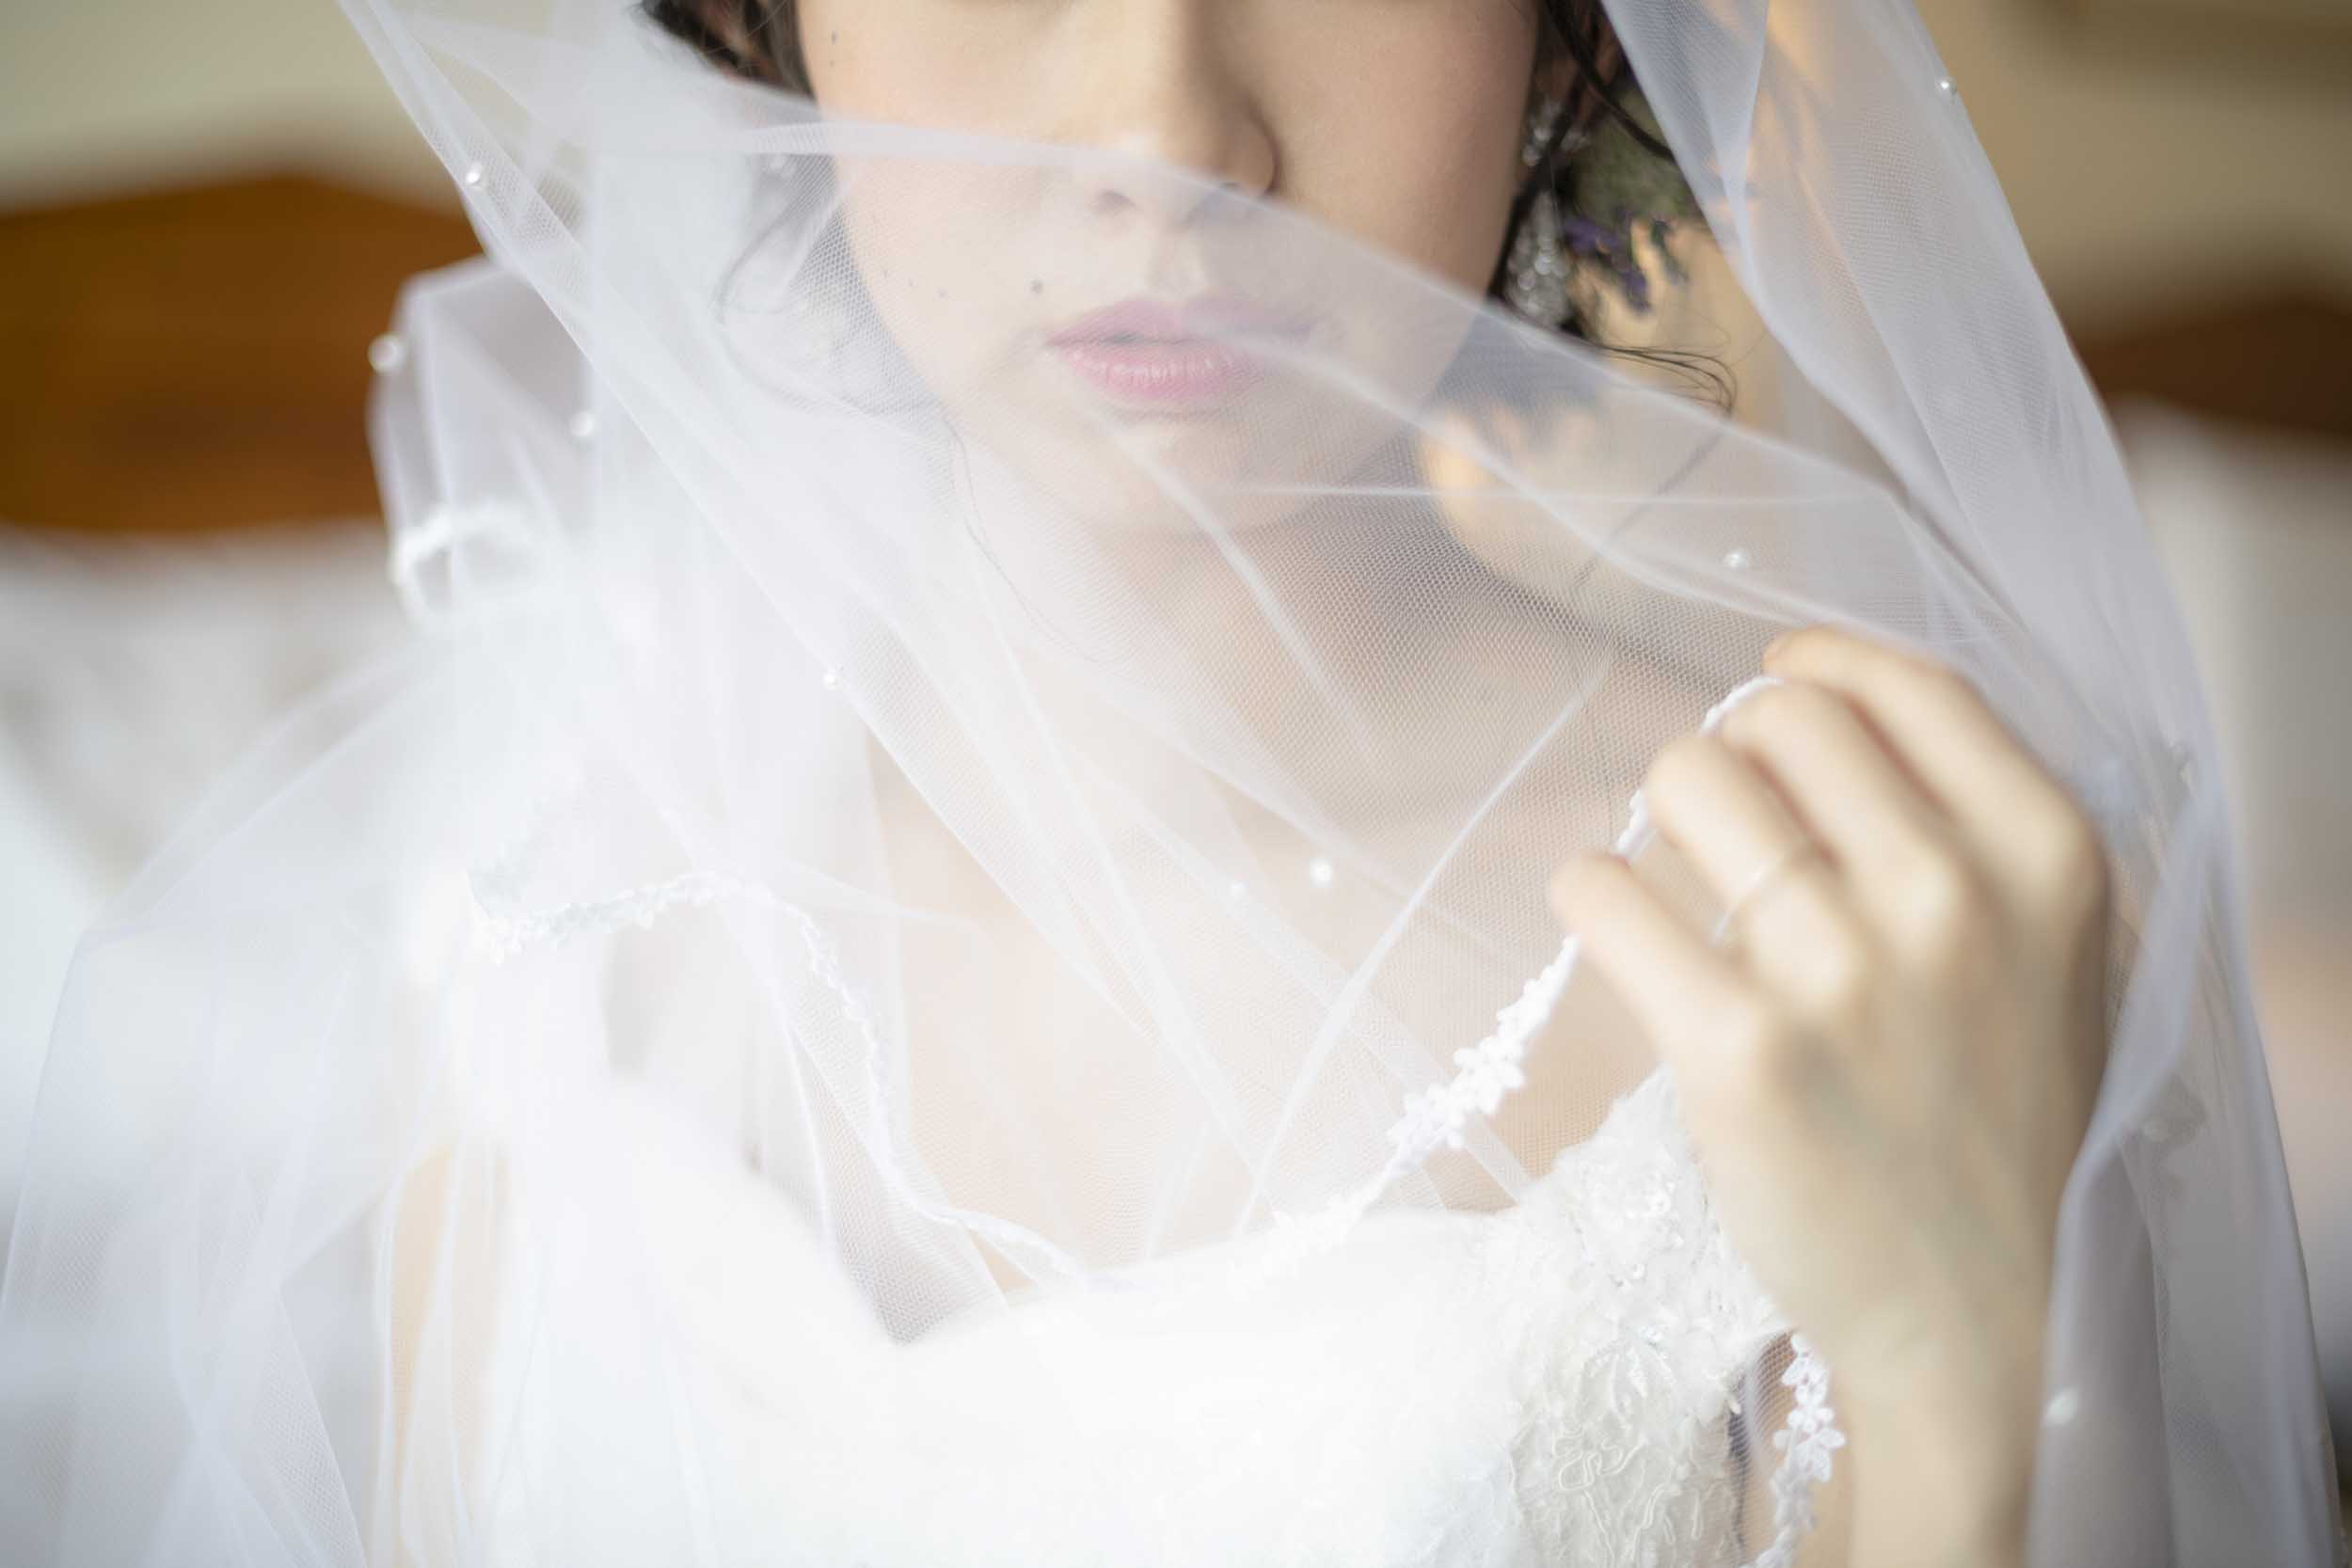 ppp_okuma_select_0012